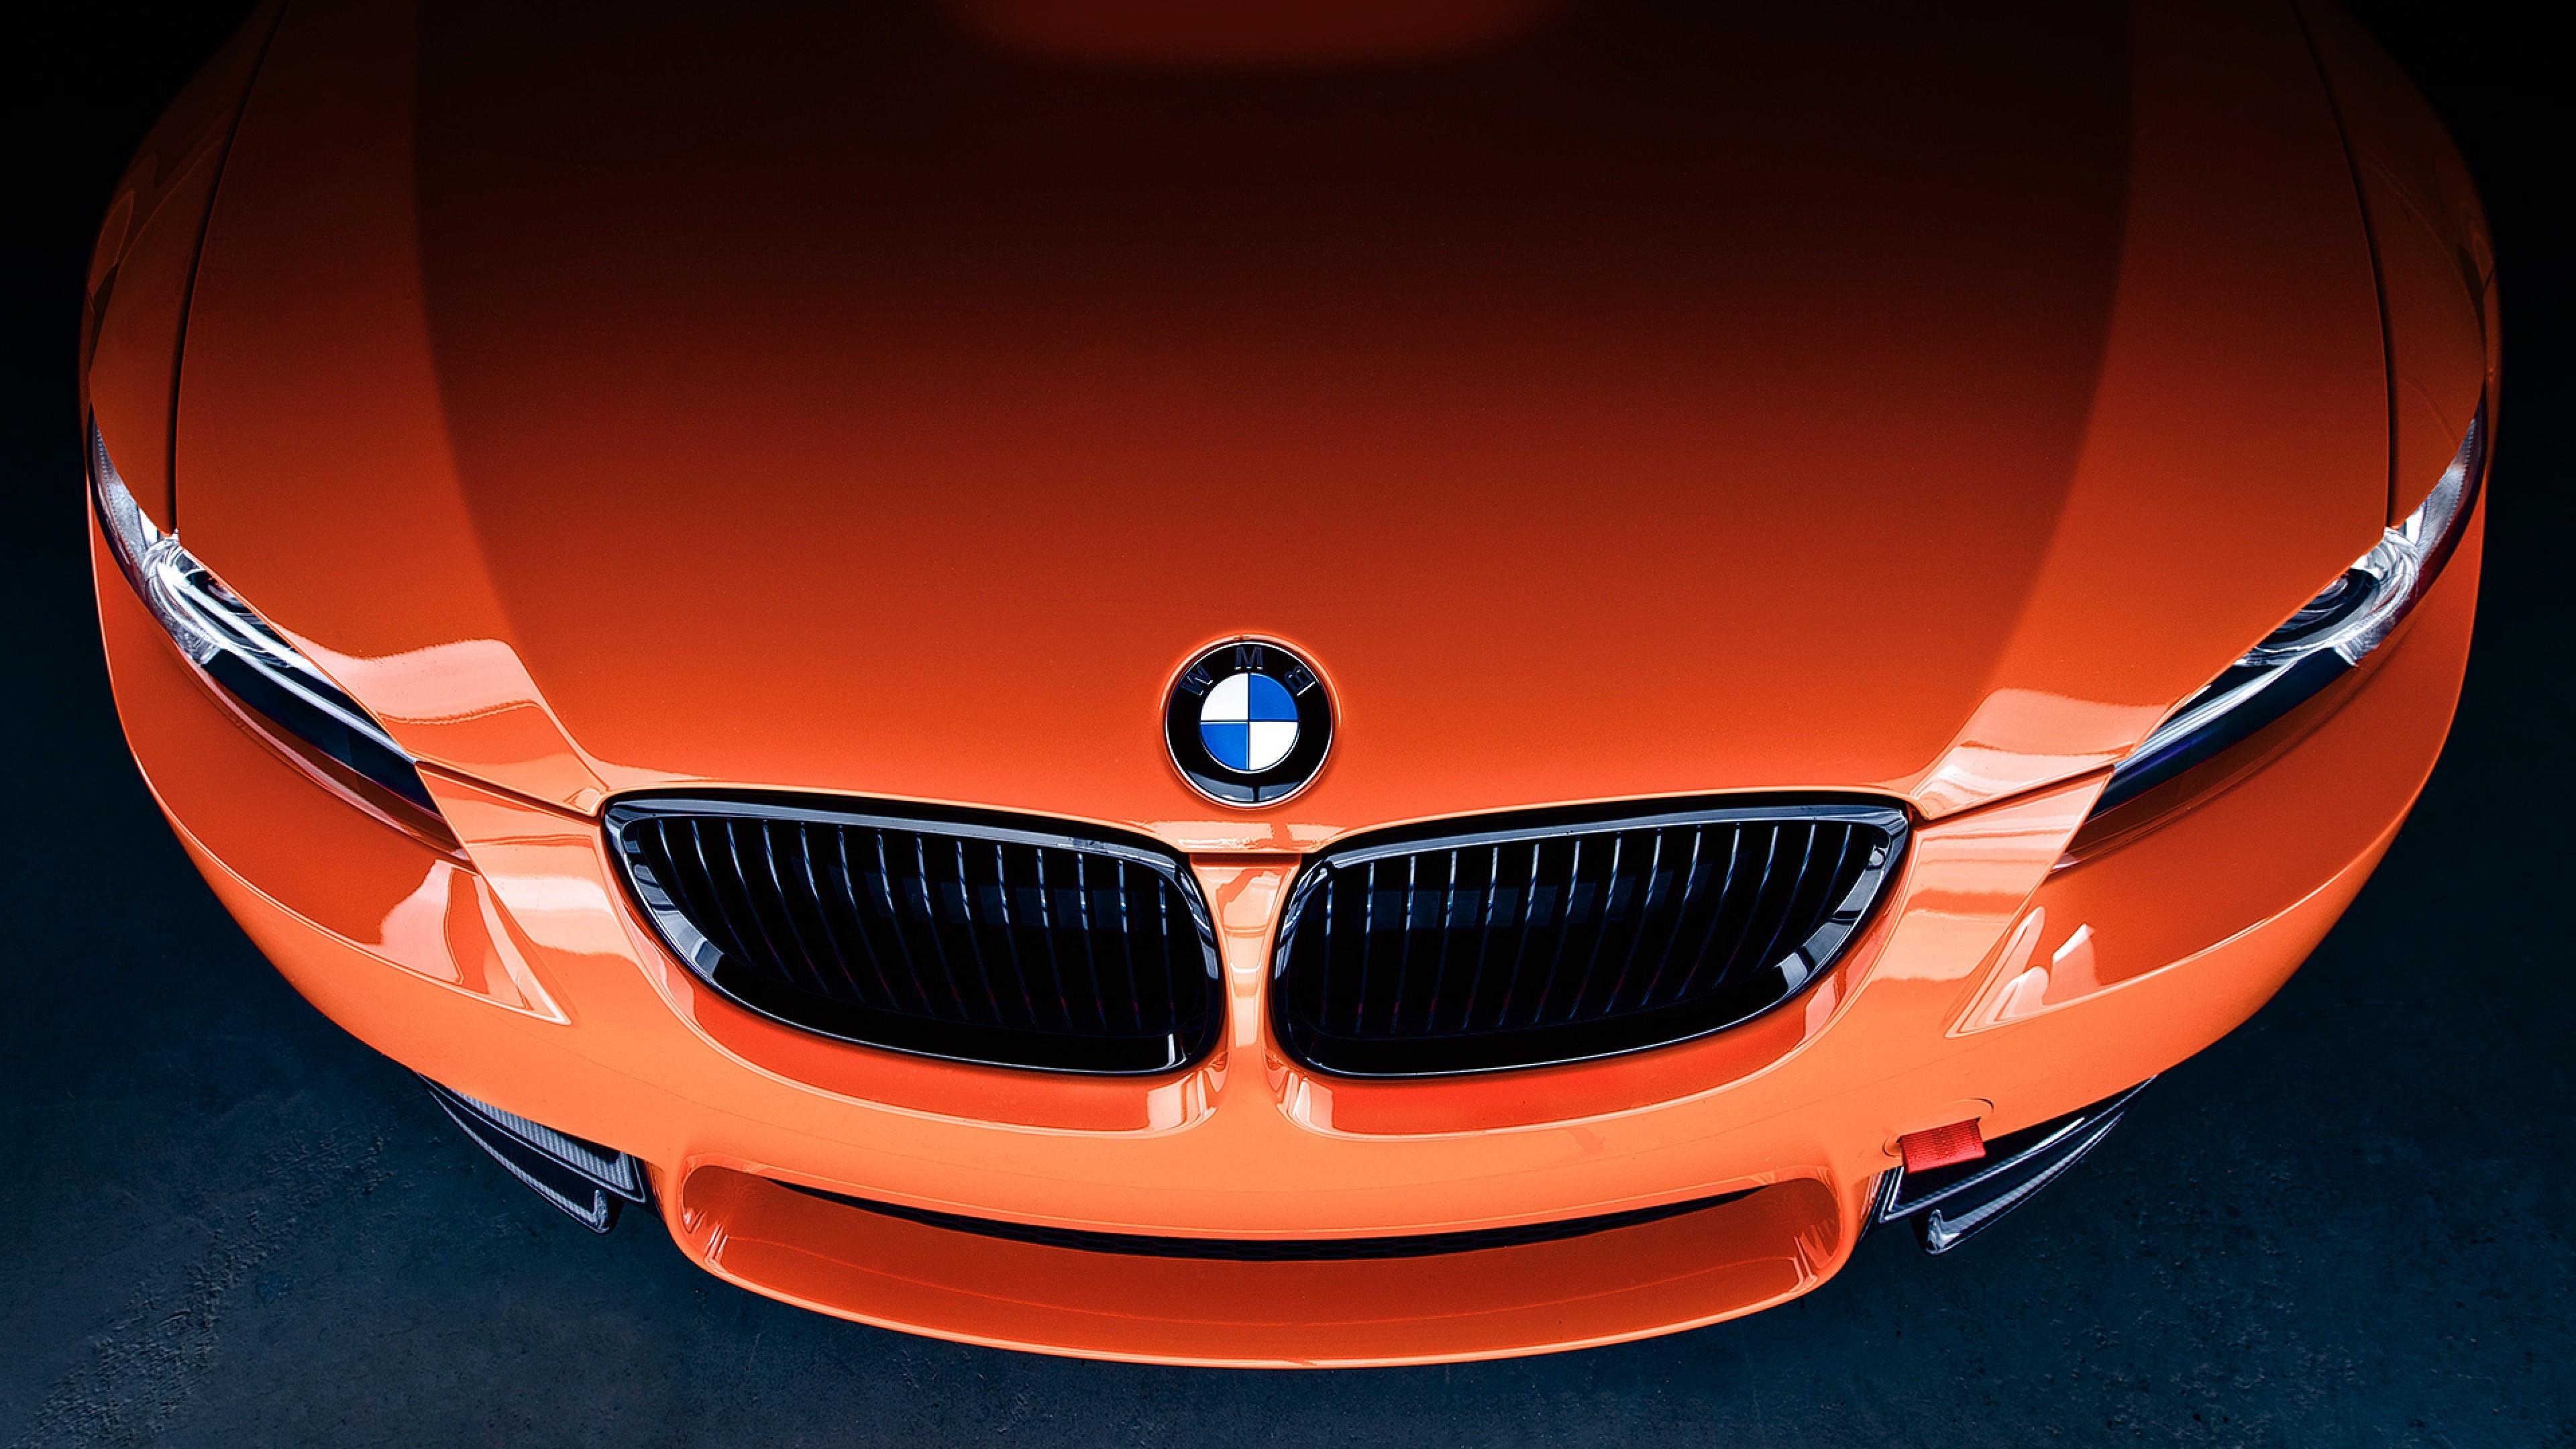 2016 Bmw M5 >> Bmw M3 Front Orange, HD Cars, 4k Wallpapers, Images ...